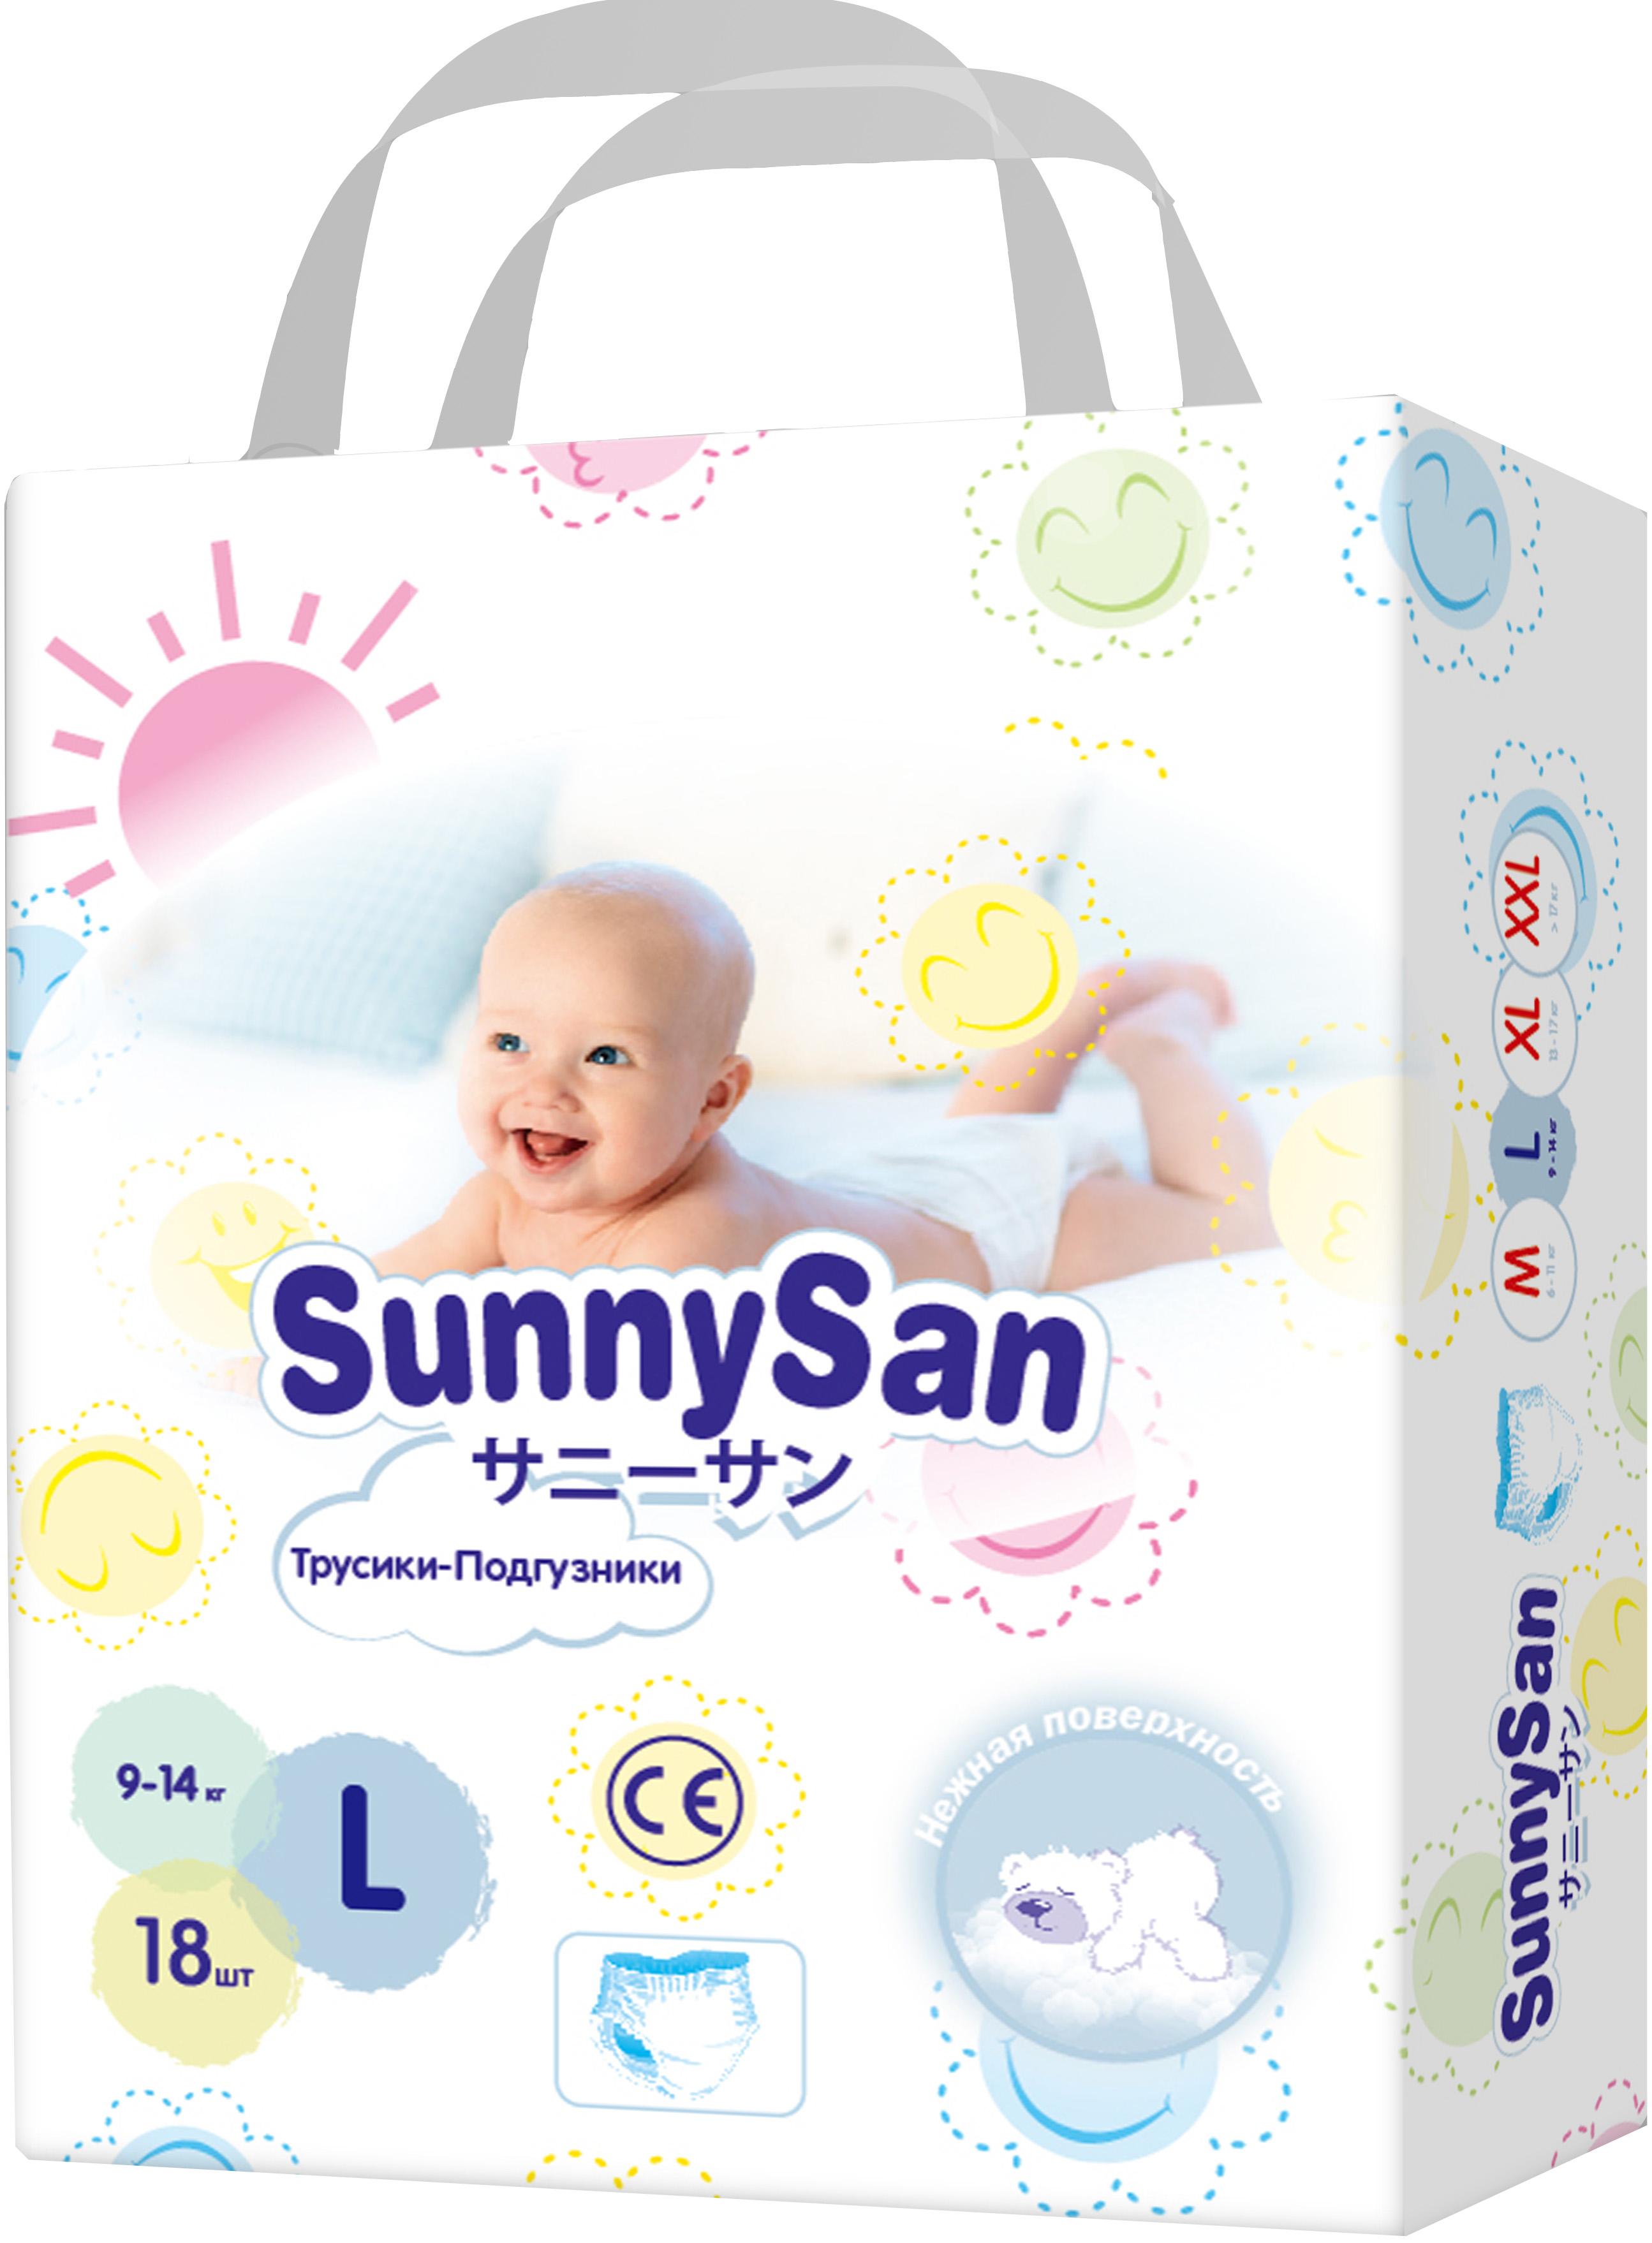 Трусики-подгузники SunnySan L (9-14 кг) 18 шт. подгузники merries l 9 14 кг 18 шт